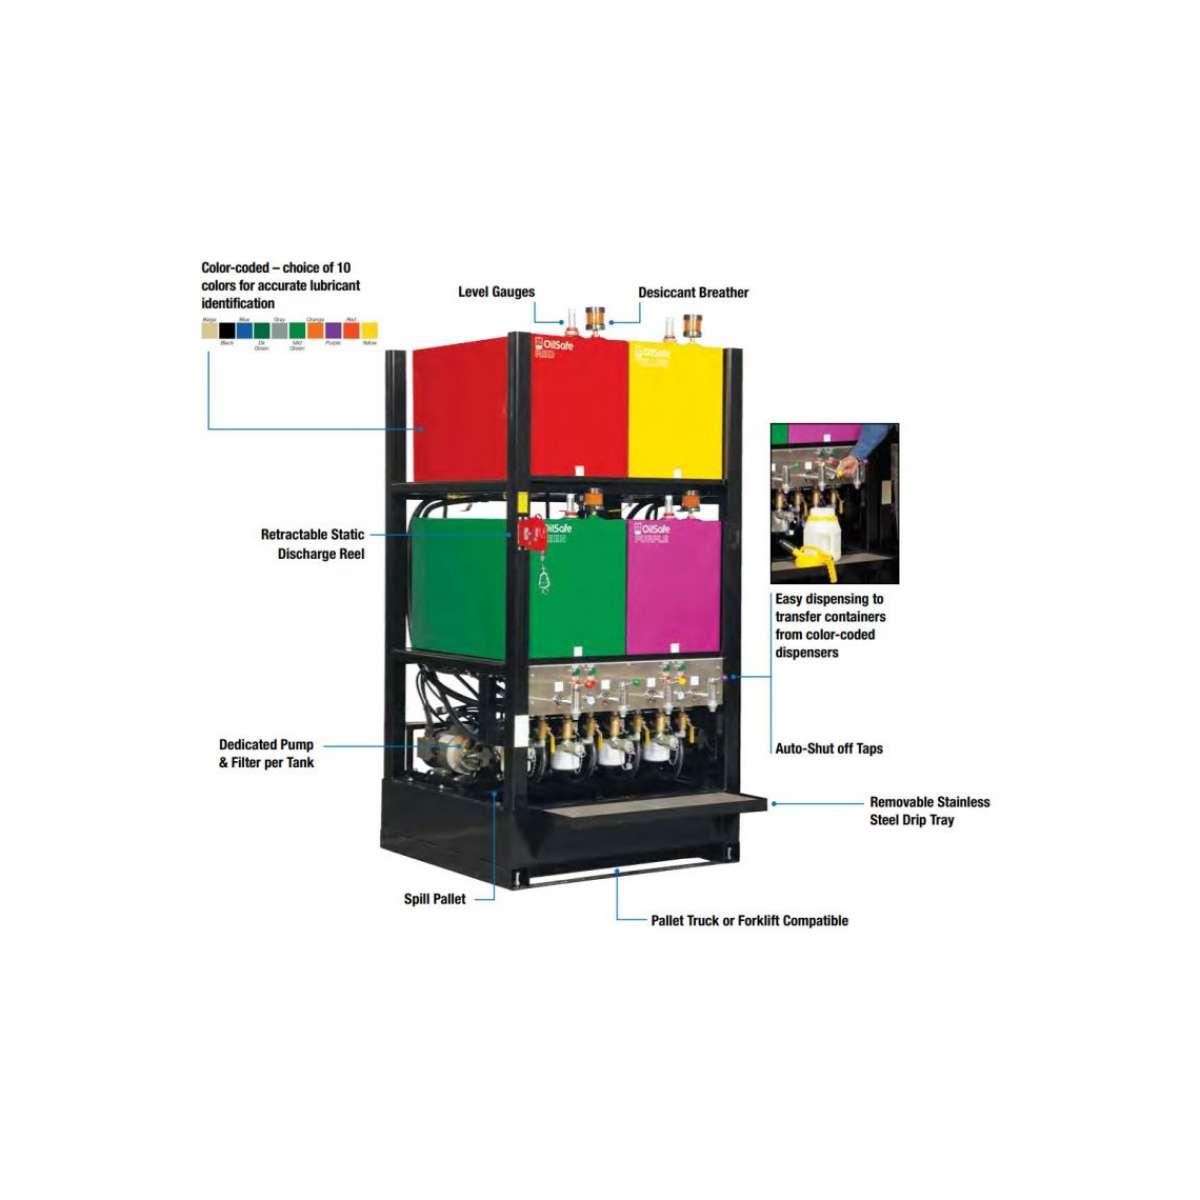 Bulk Oil Storage System - 4 x 65 Gallon Tanks